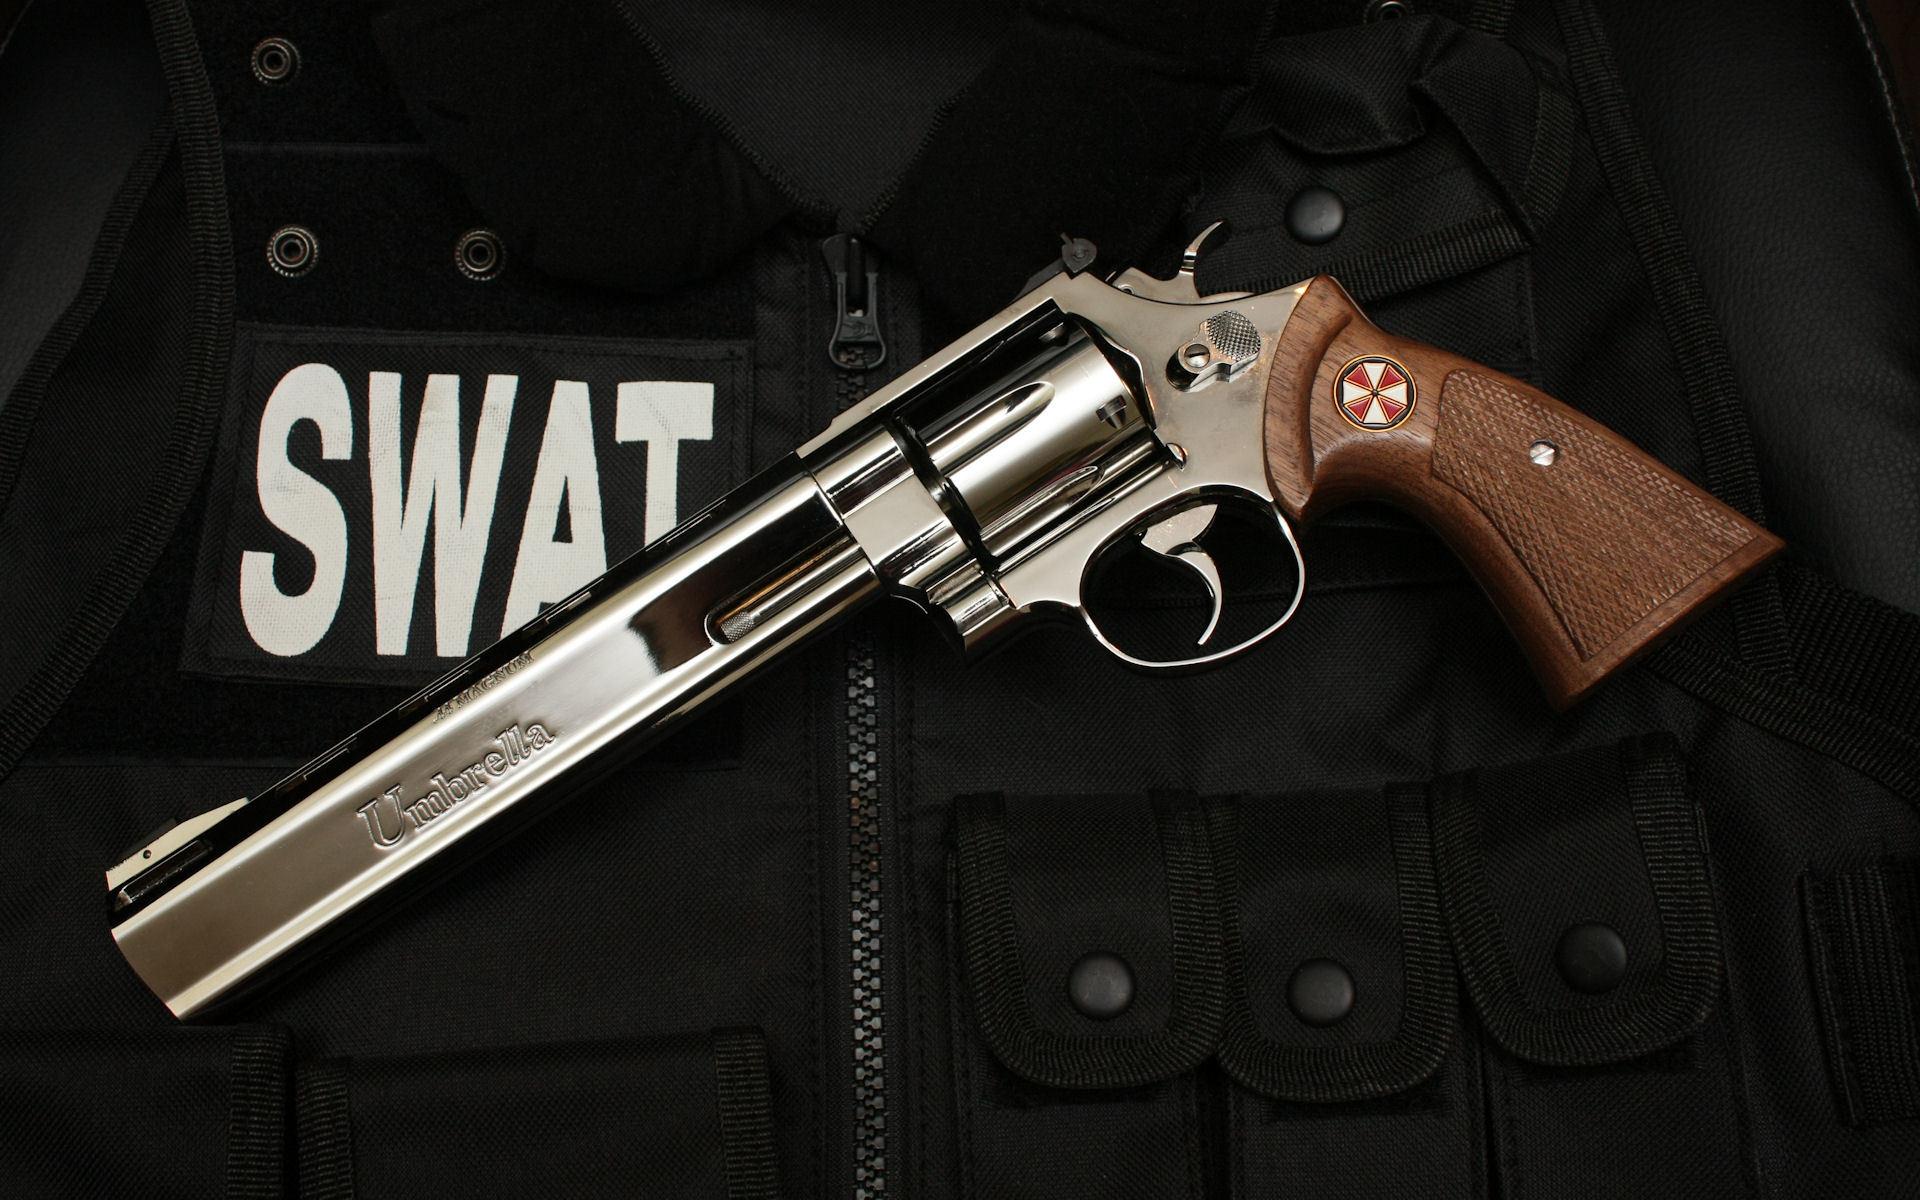 Swat Revolvers Weapons Umbrella